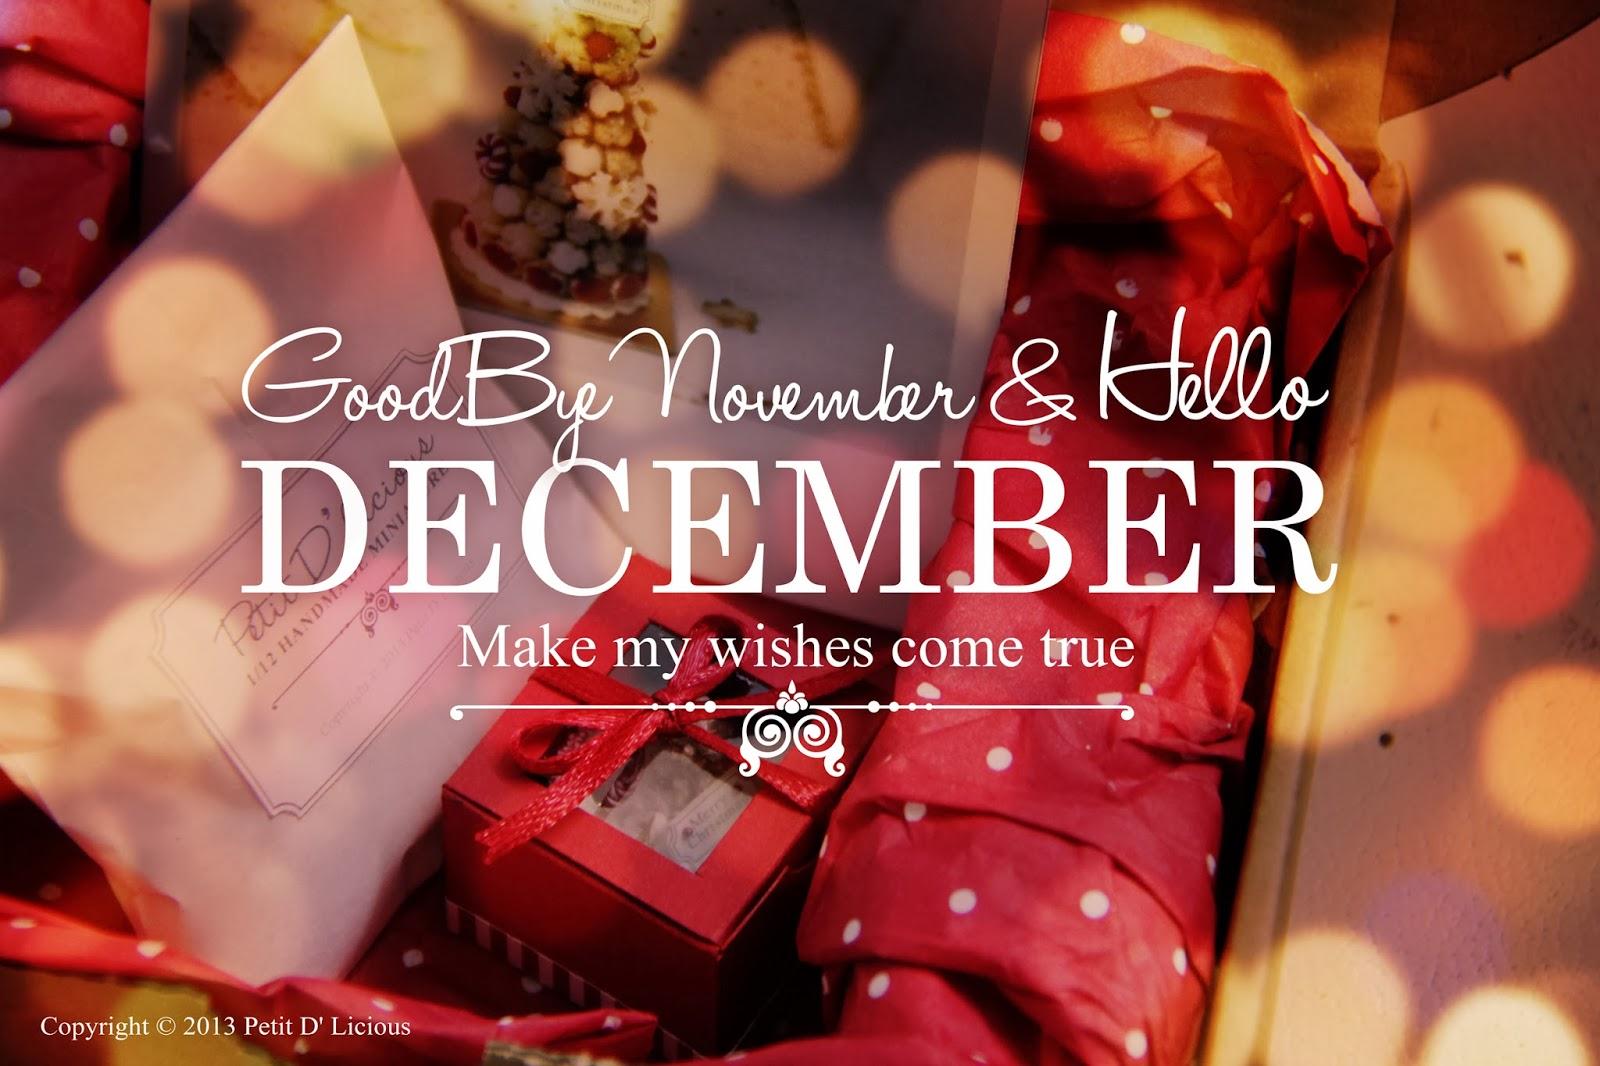 Wednesday, 4 December 2013